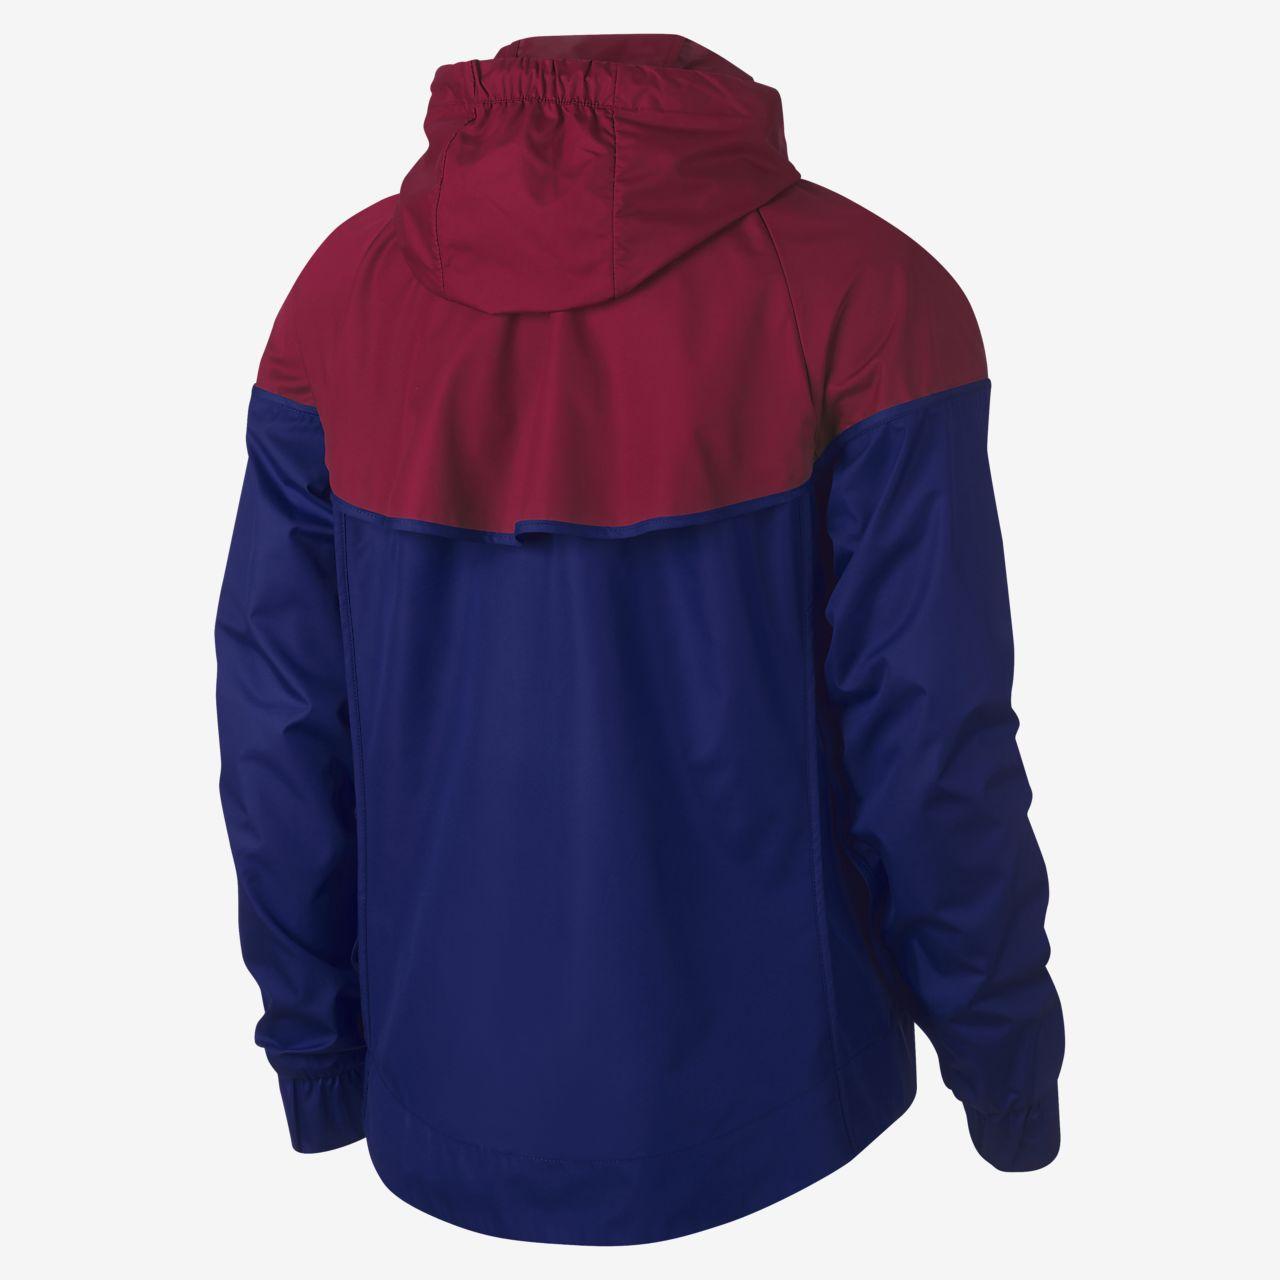 b1dcf4257ea Low Resolution Женская куртка FC Barcelona Windrunner Женская куртка FC  Barcelona Windrunner